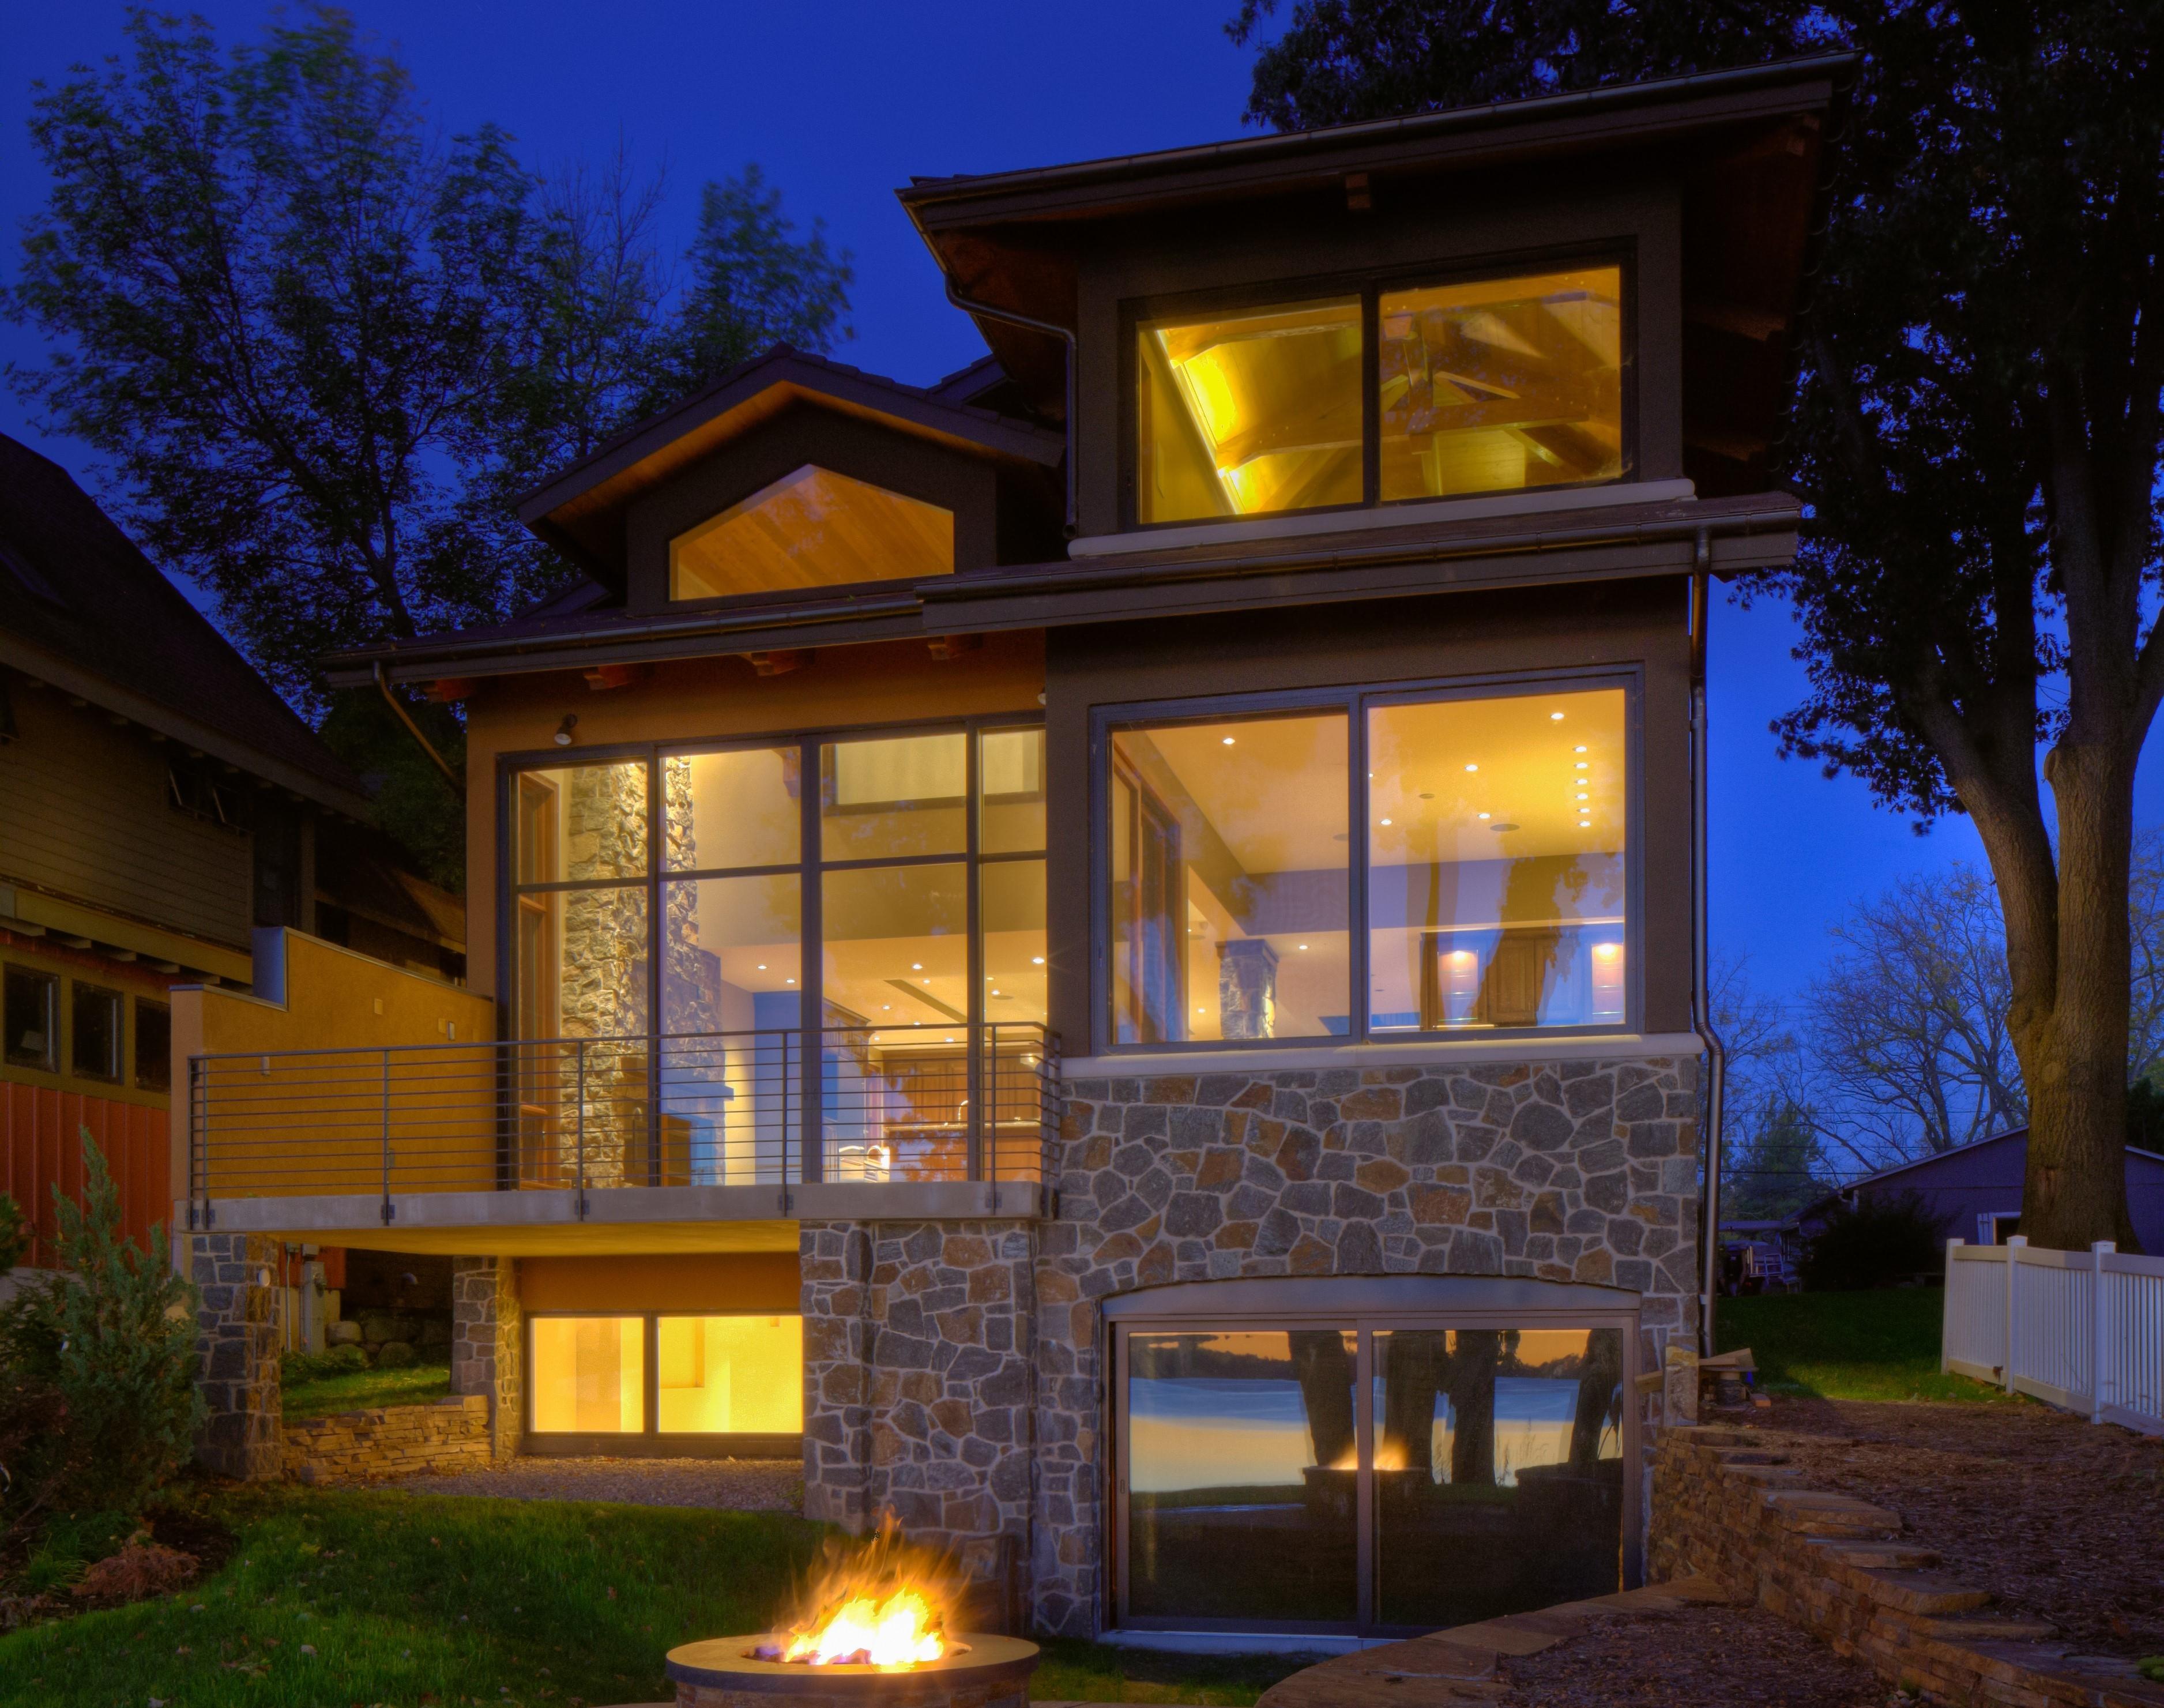 Window design center madison wisconsin wi for Window design center